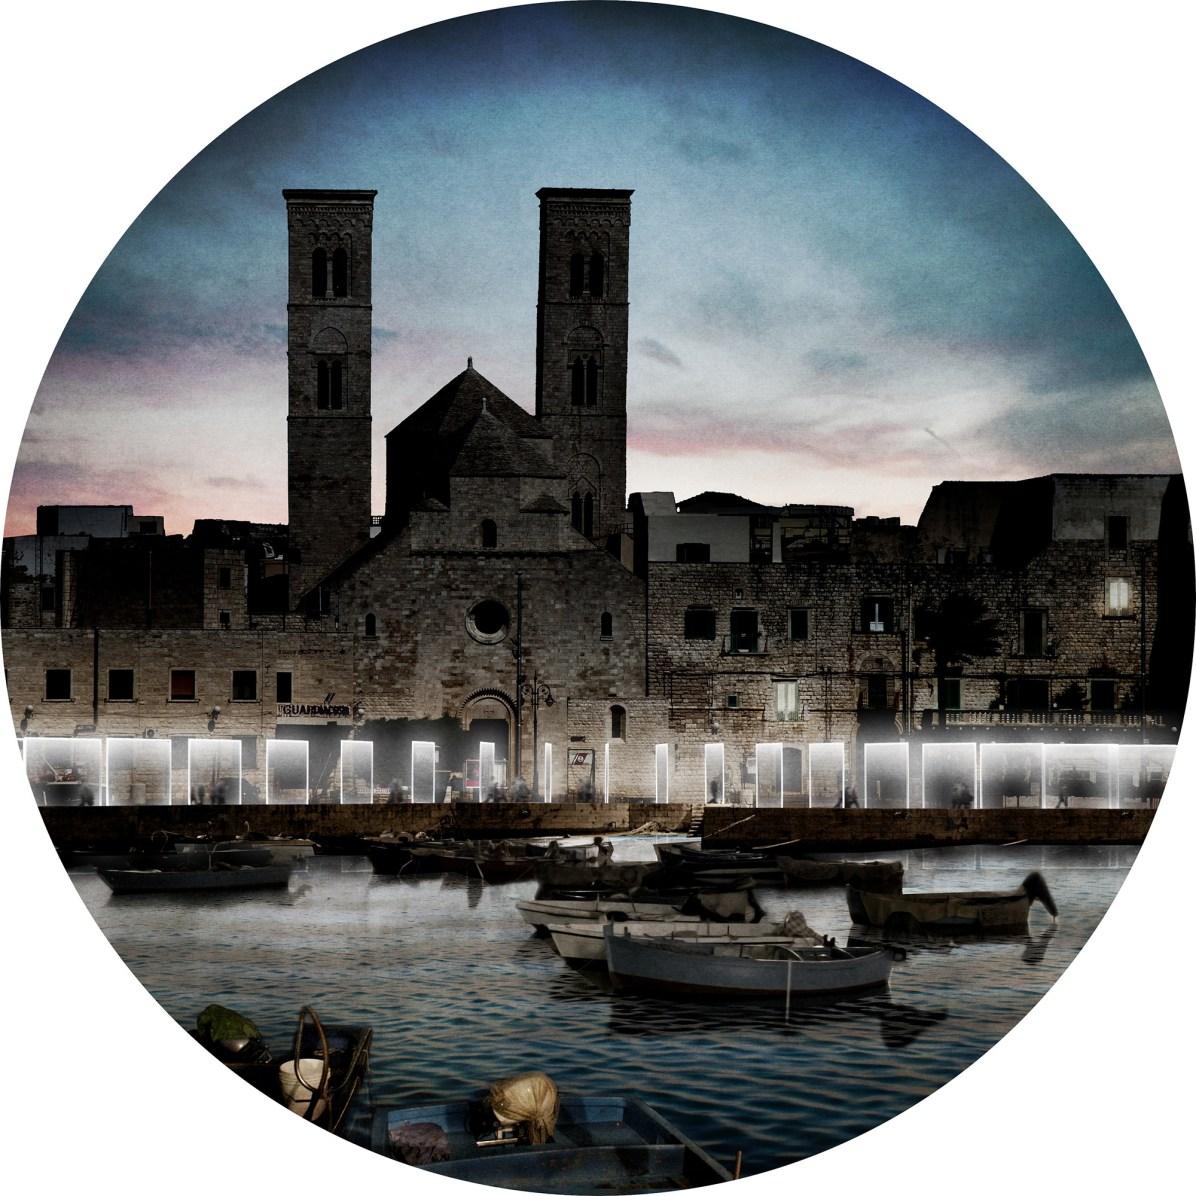 Waterfront - Baldassarre, Cipri, Dentamaro, Faccitondo, Salvatore, Valente